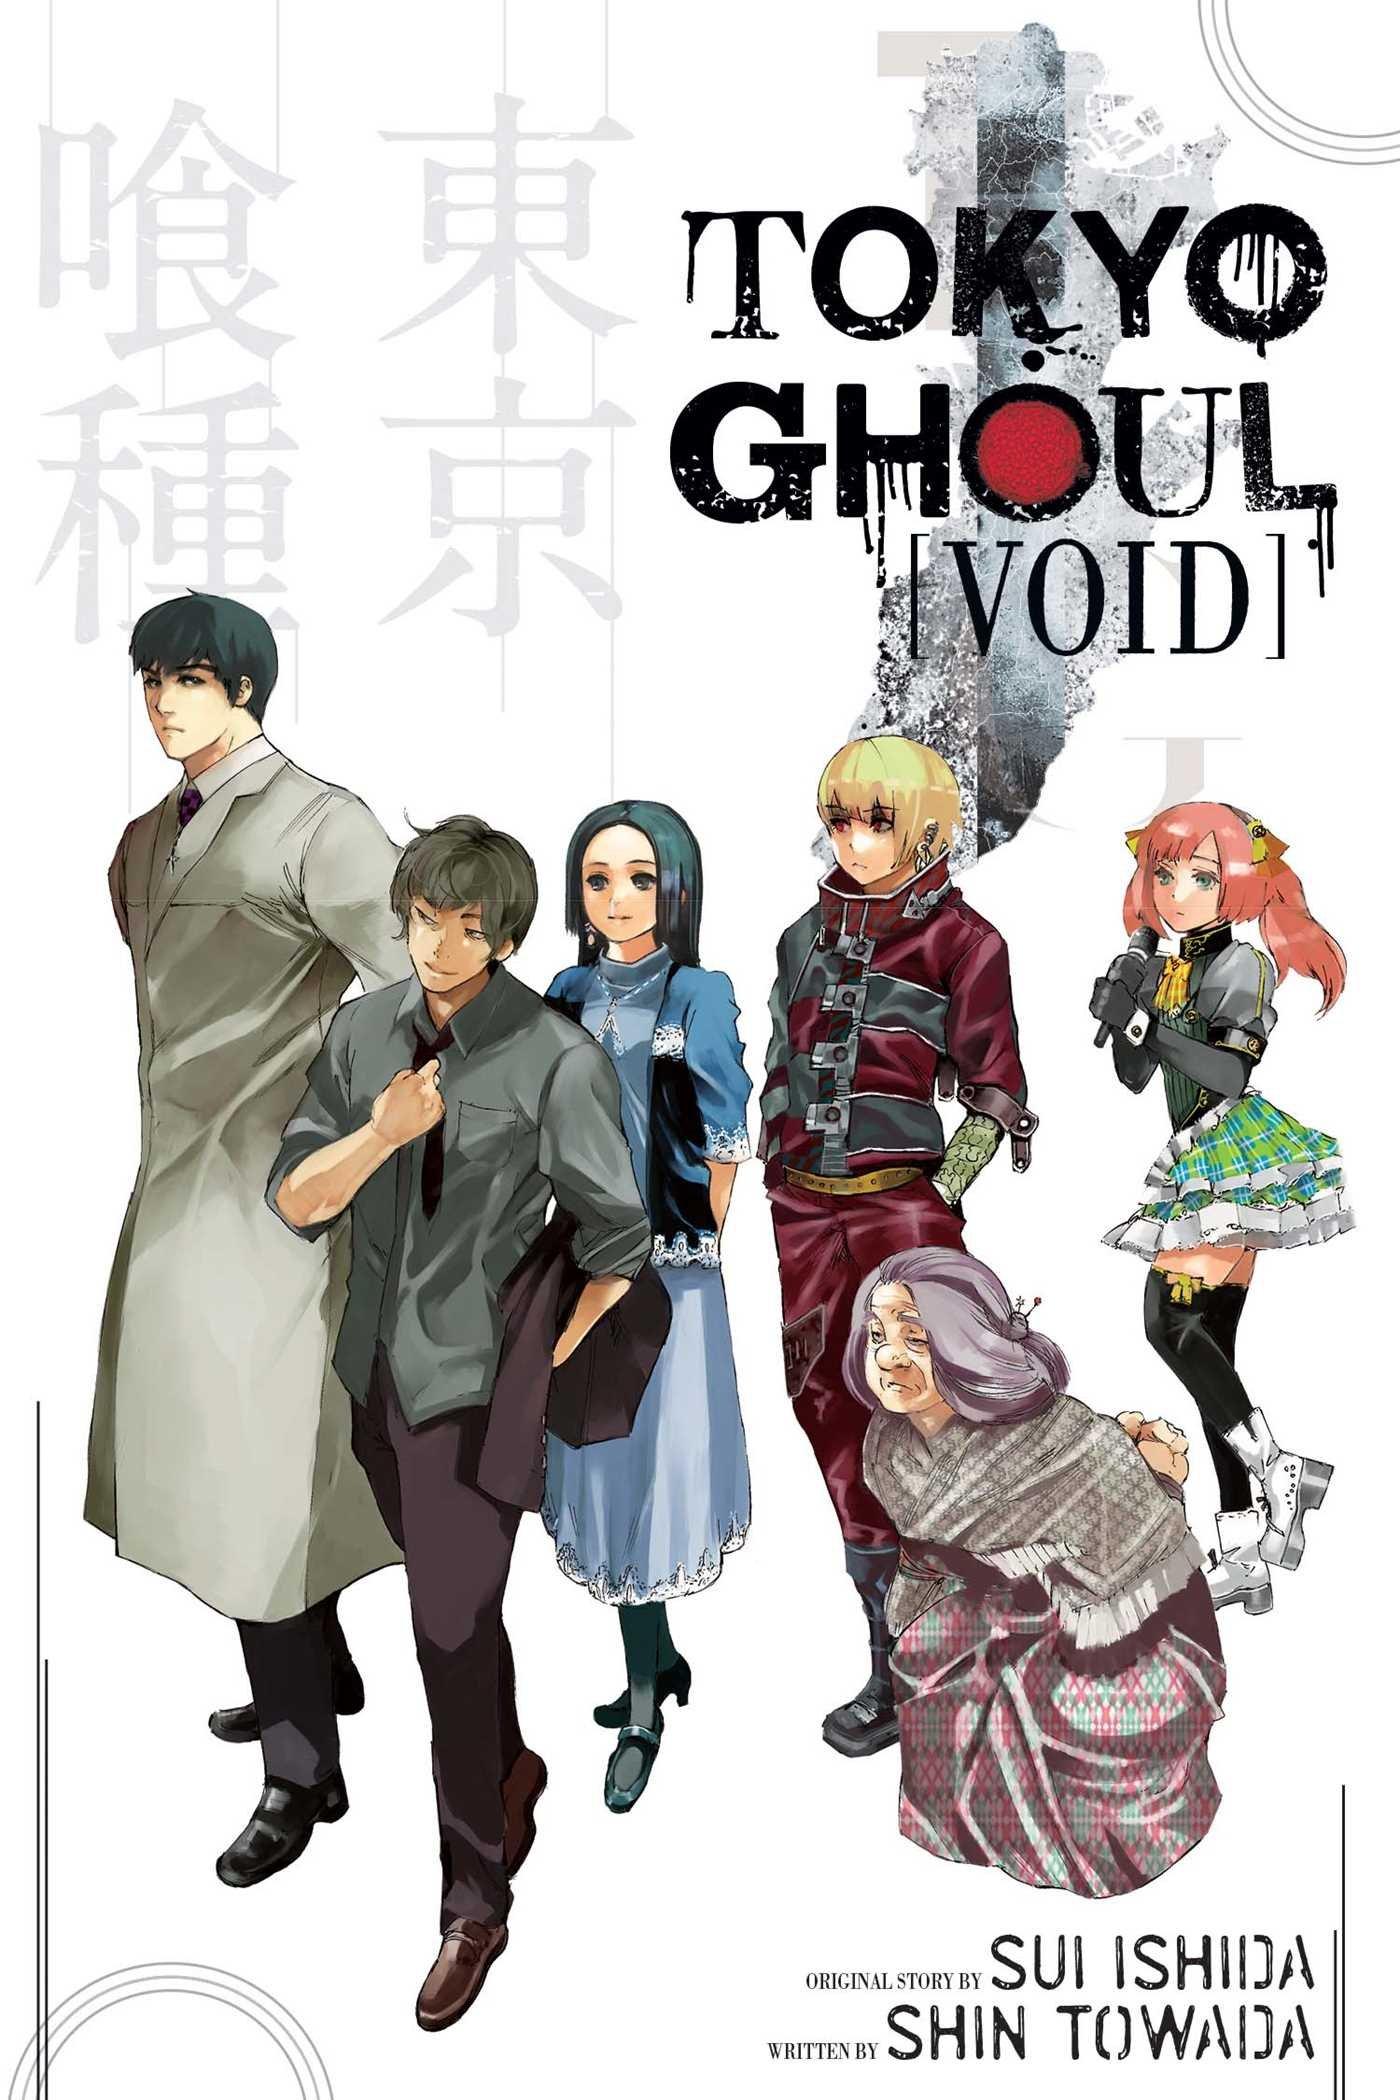 Amazon Com Tokyo Ghoul Void Void Tokyo Ghoul Novels 9781421590585 Frane Kevin Towada Shin Ishida Sui Giles Morgan Books